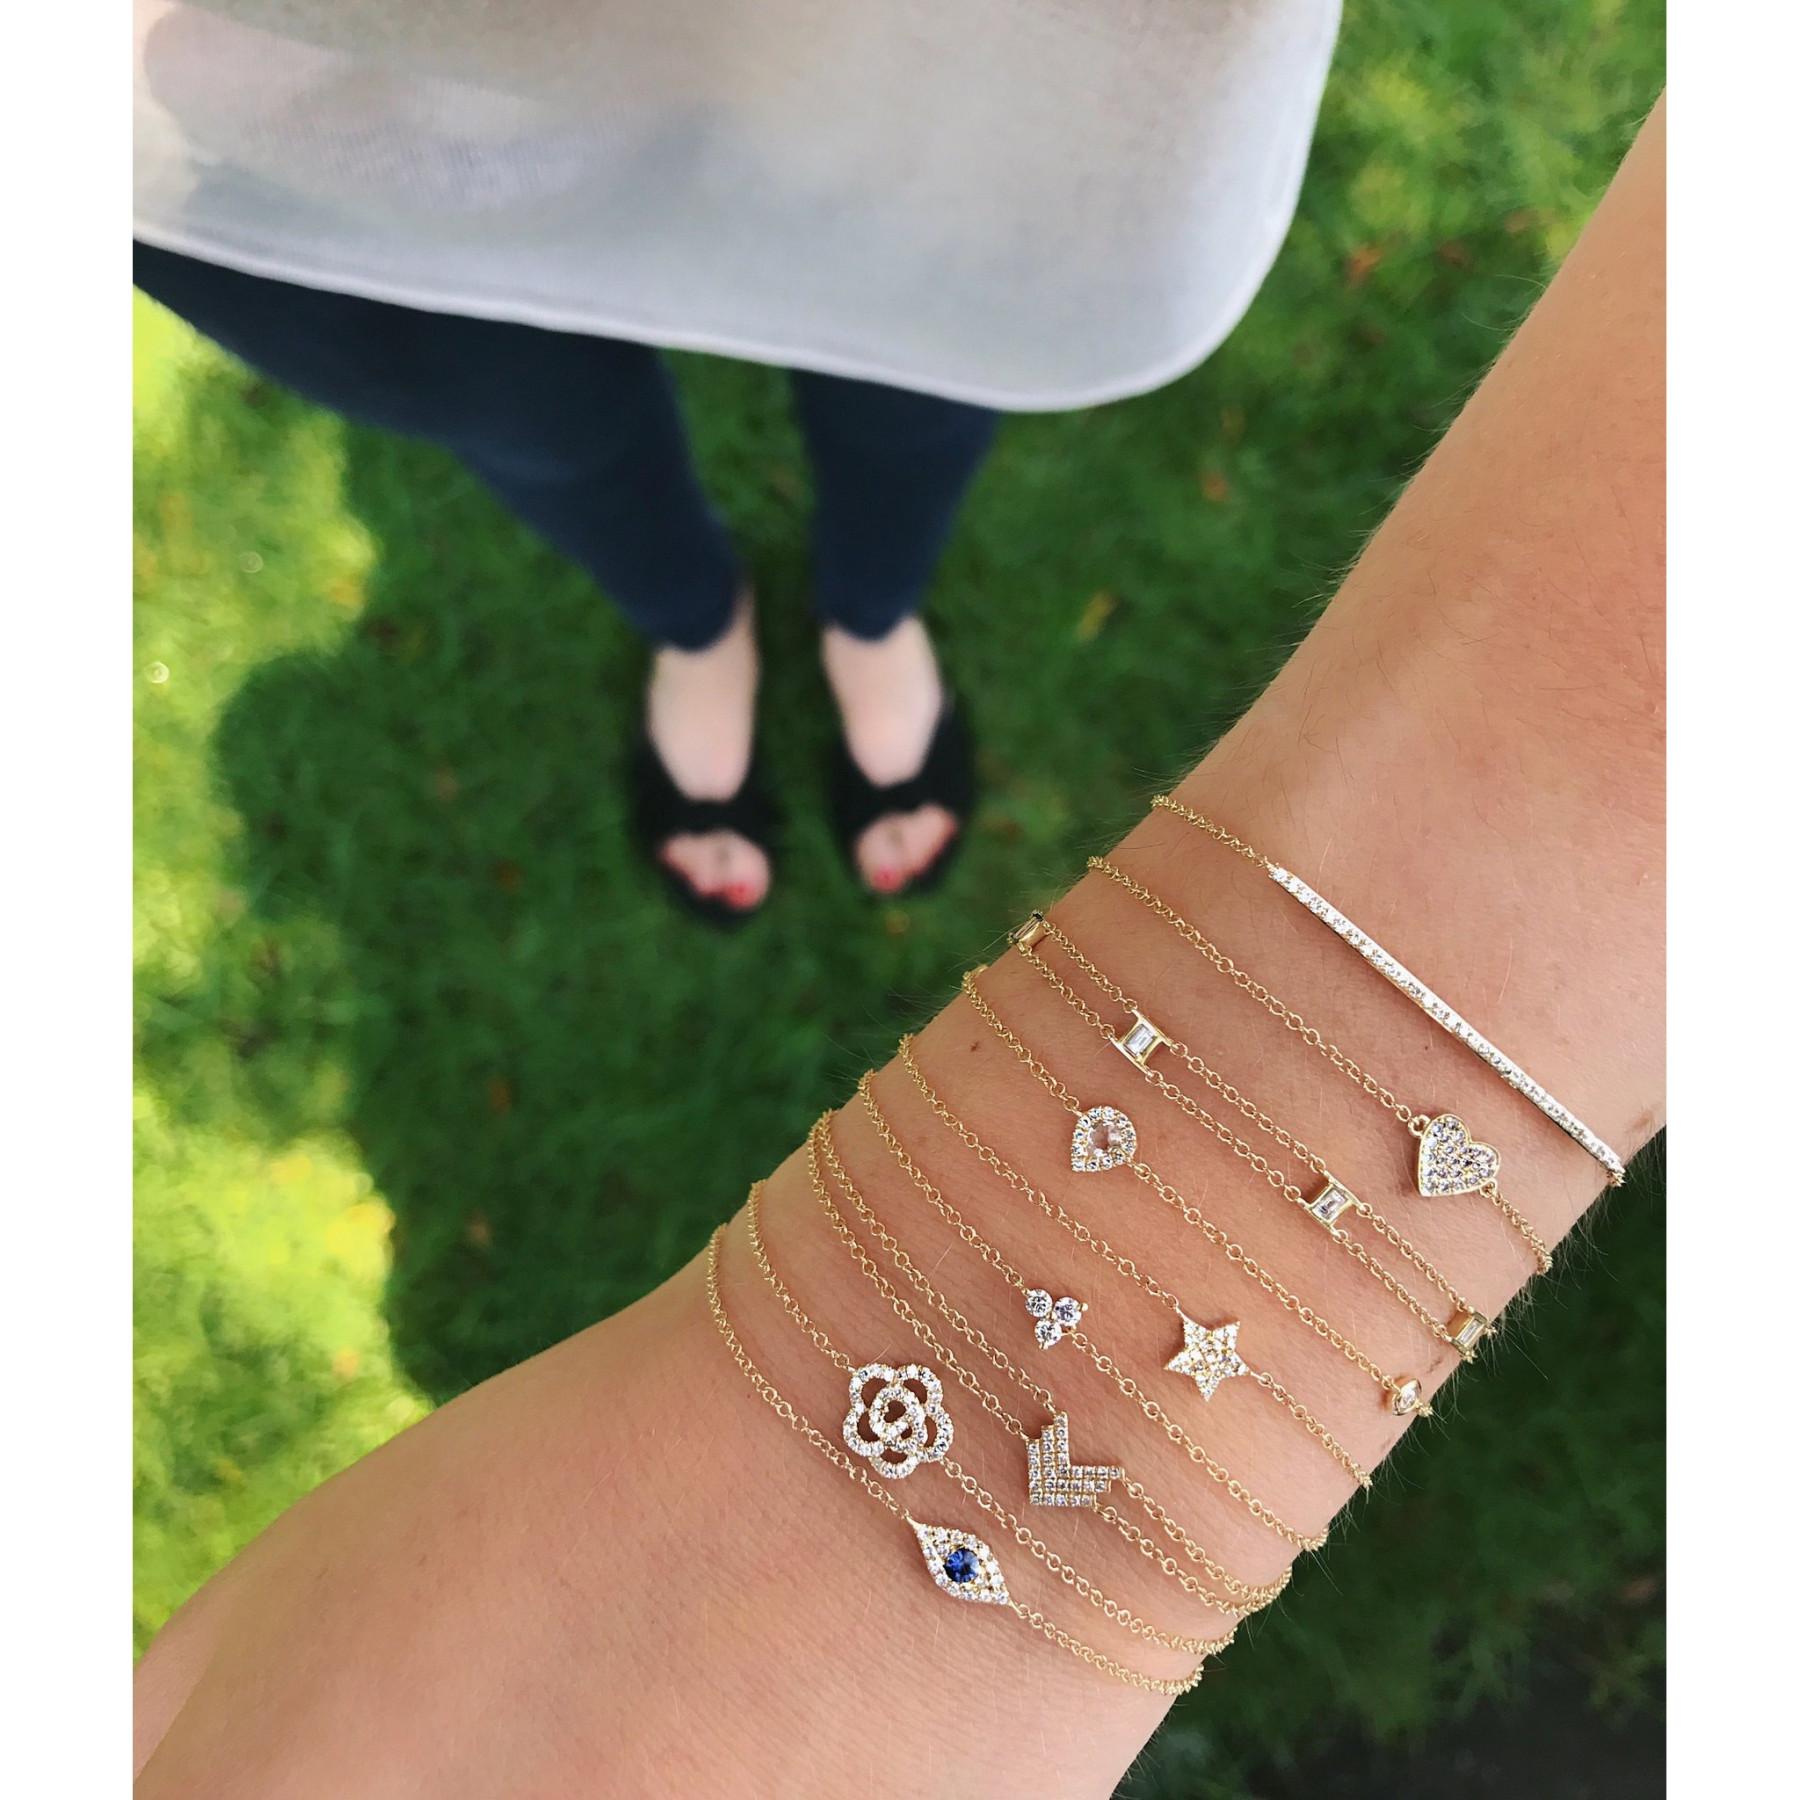 EF Collection Mini Diamond Star Yellow Gold Chain Bracelet on Model